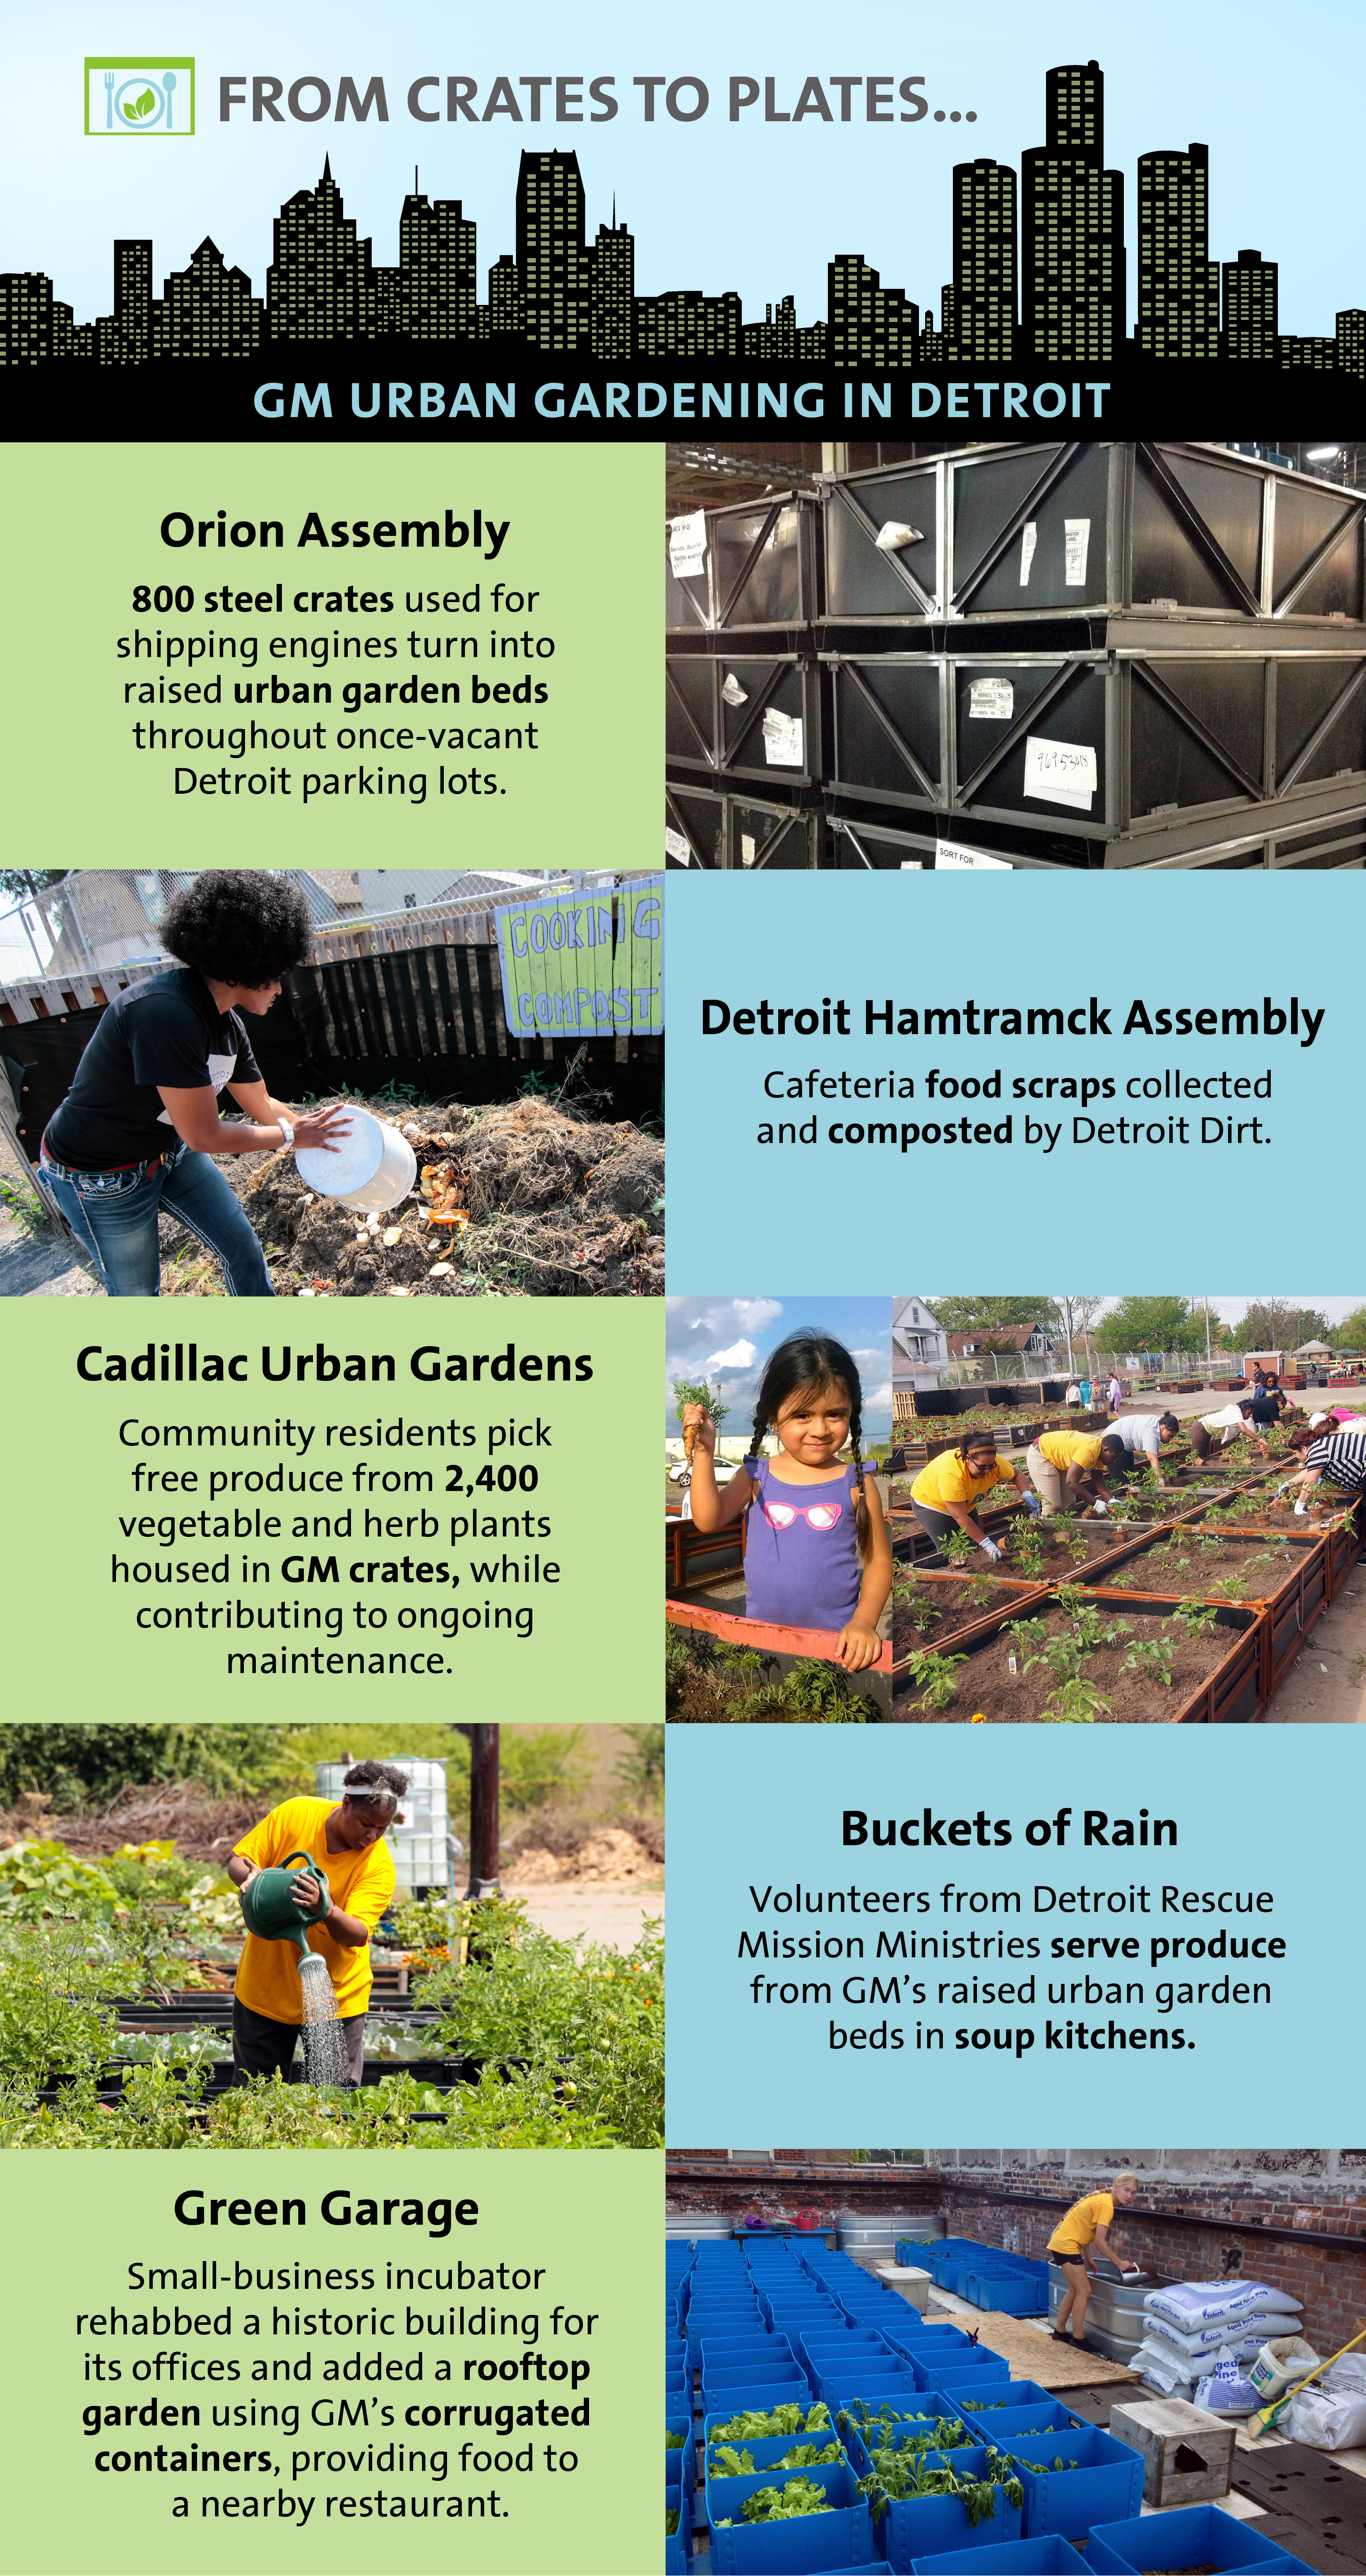 GM Develops Green Thumb in Urban Gardening | 3BL Media